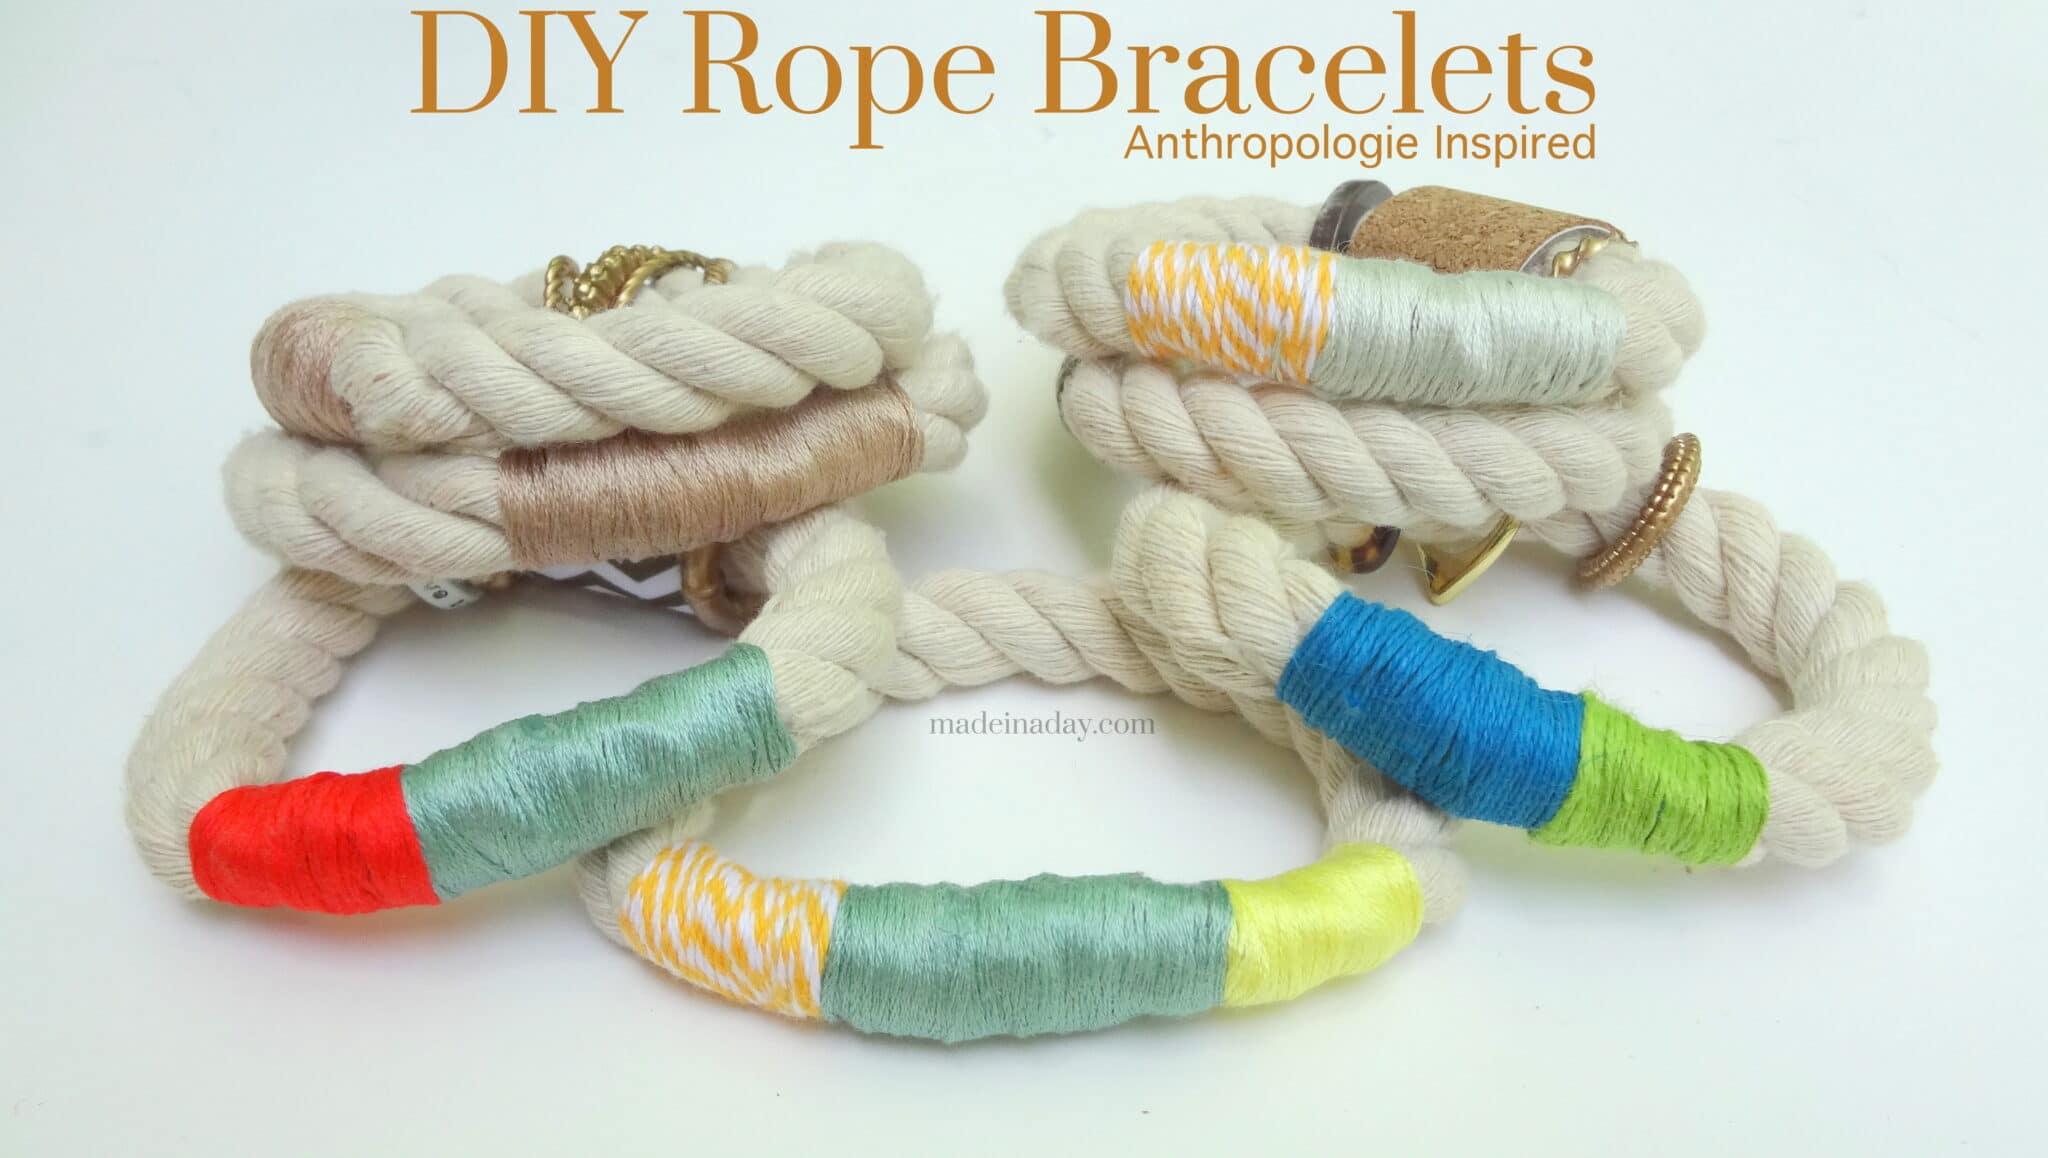 Rope Bracelets #anthrohack